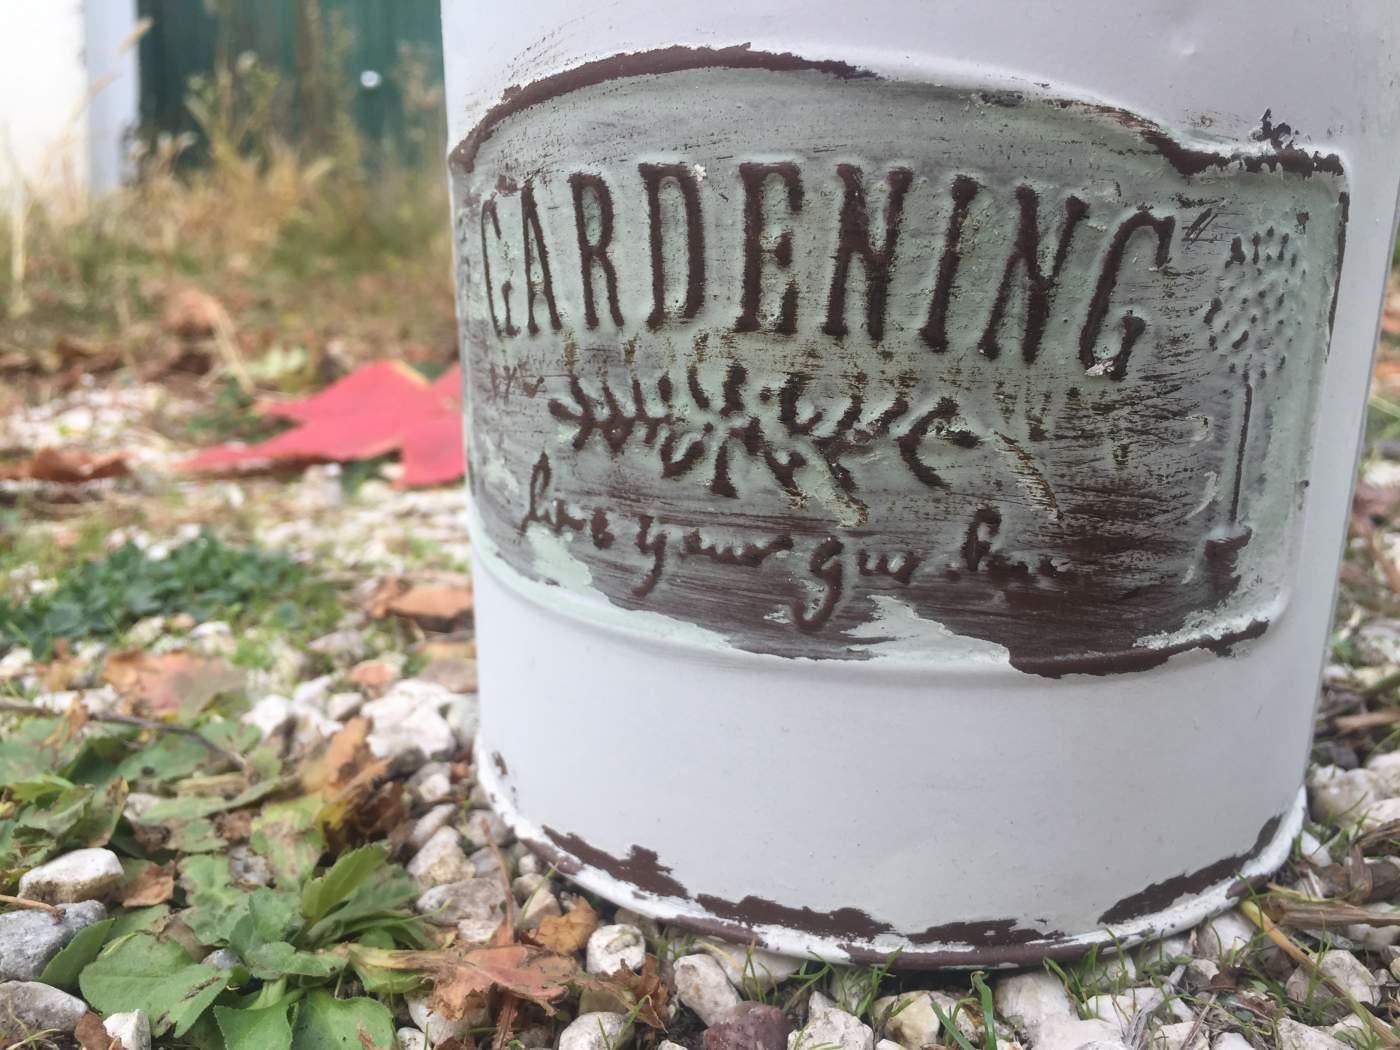 Tejeskanna Kaspó Gardening Felirattal